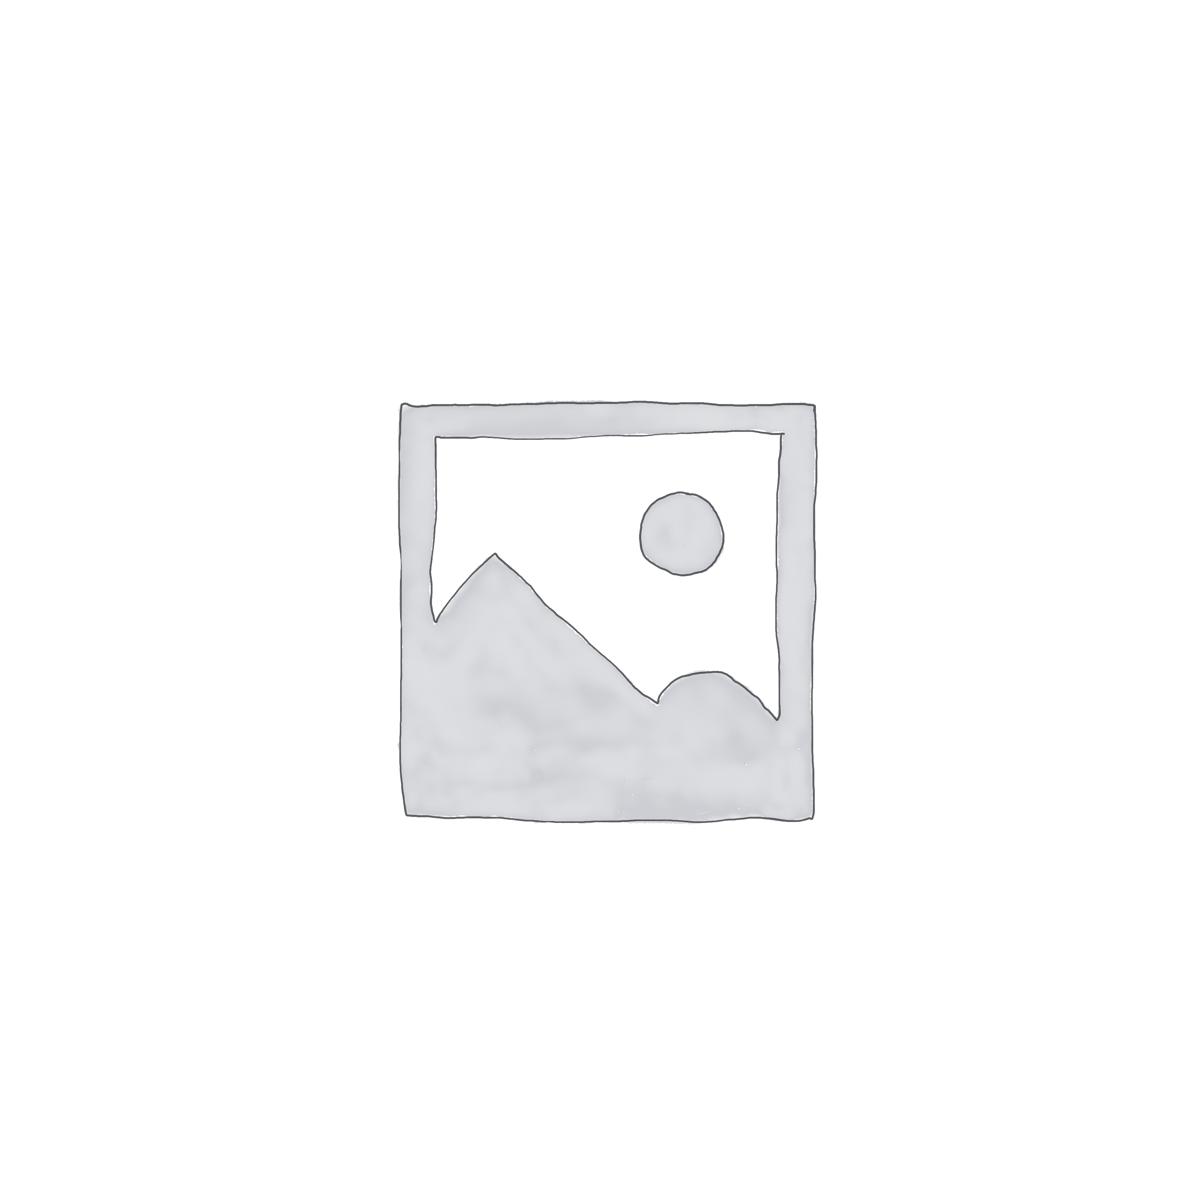 Black And White Floral Wallpaper Mural Wallpaper Wallmur